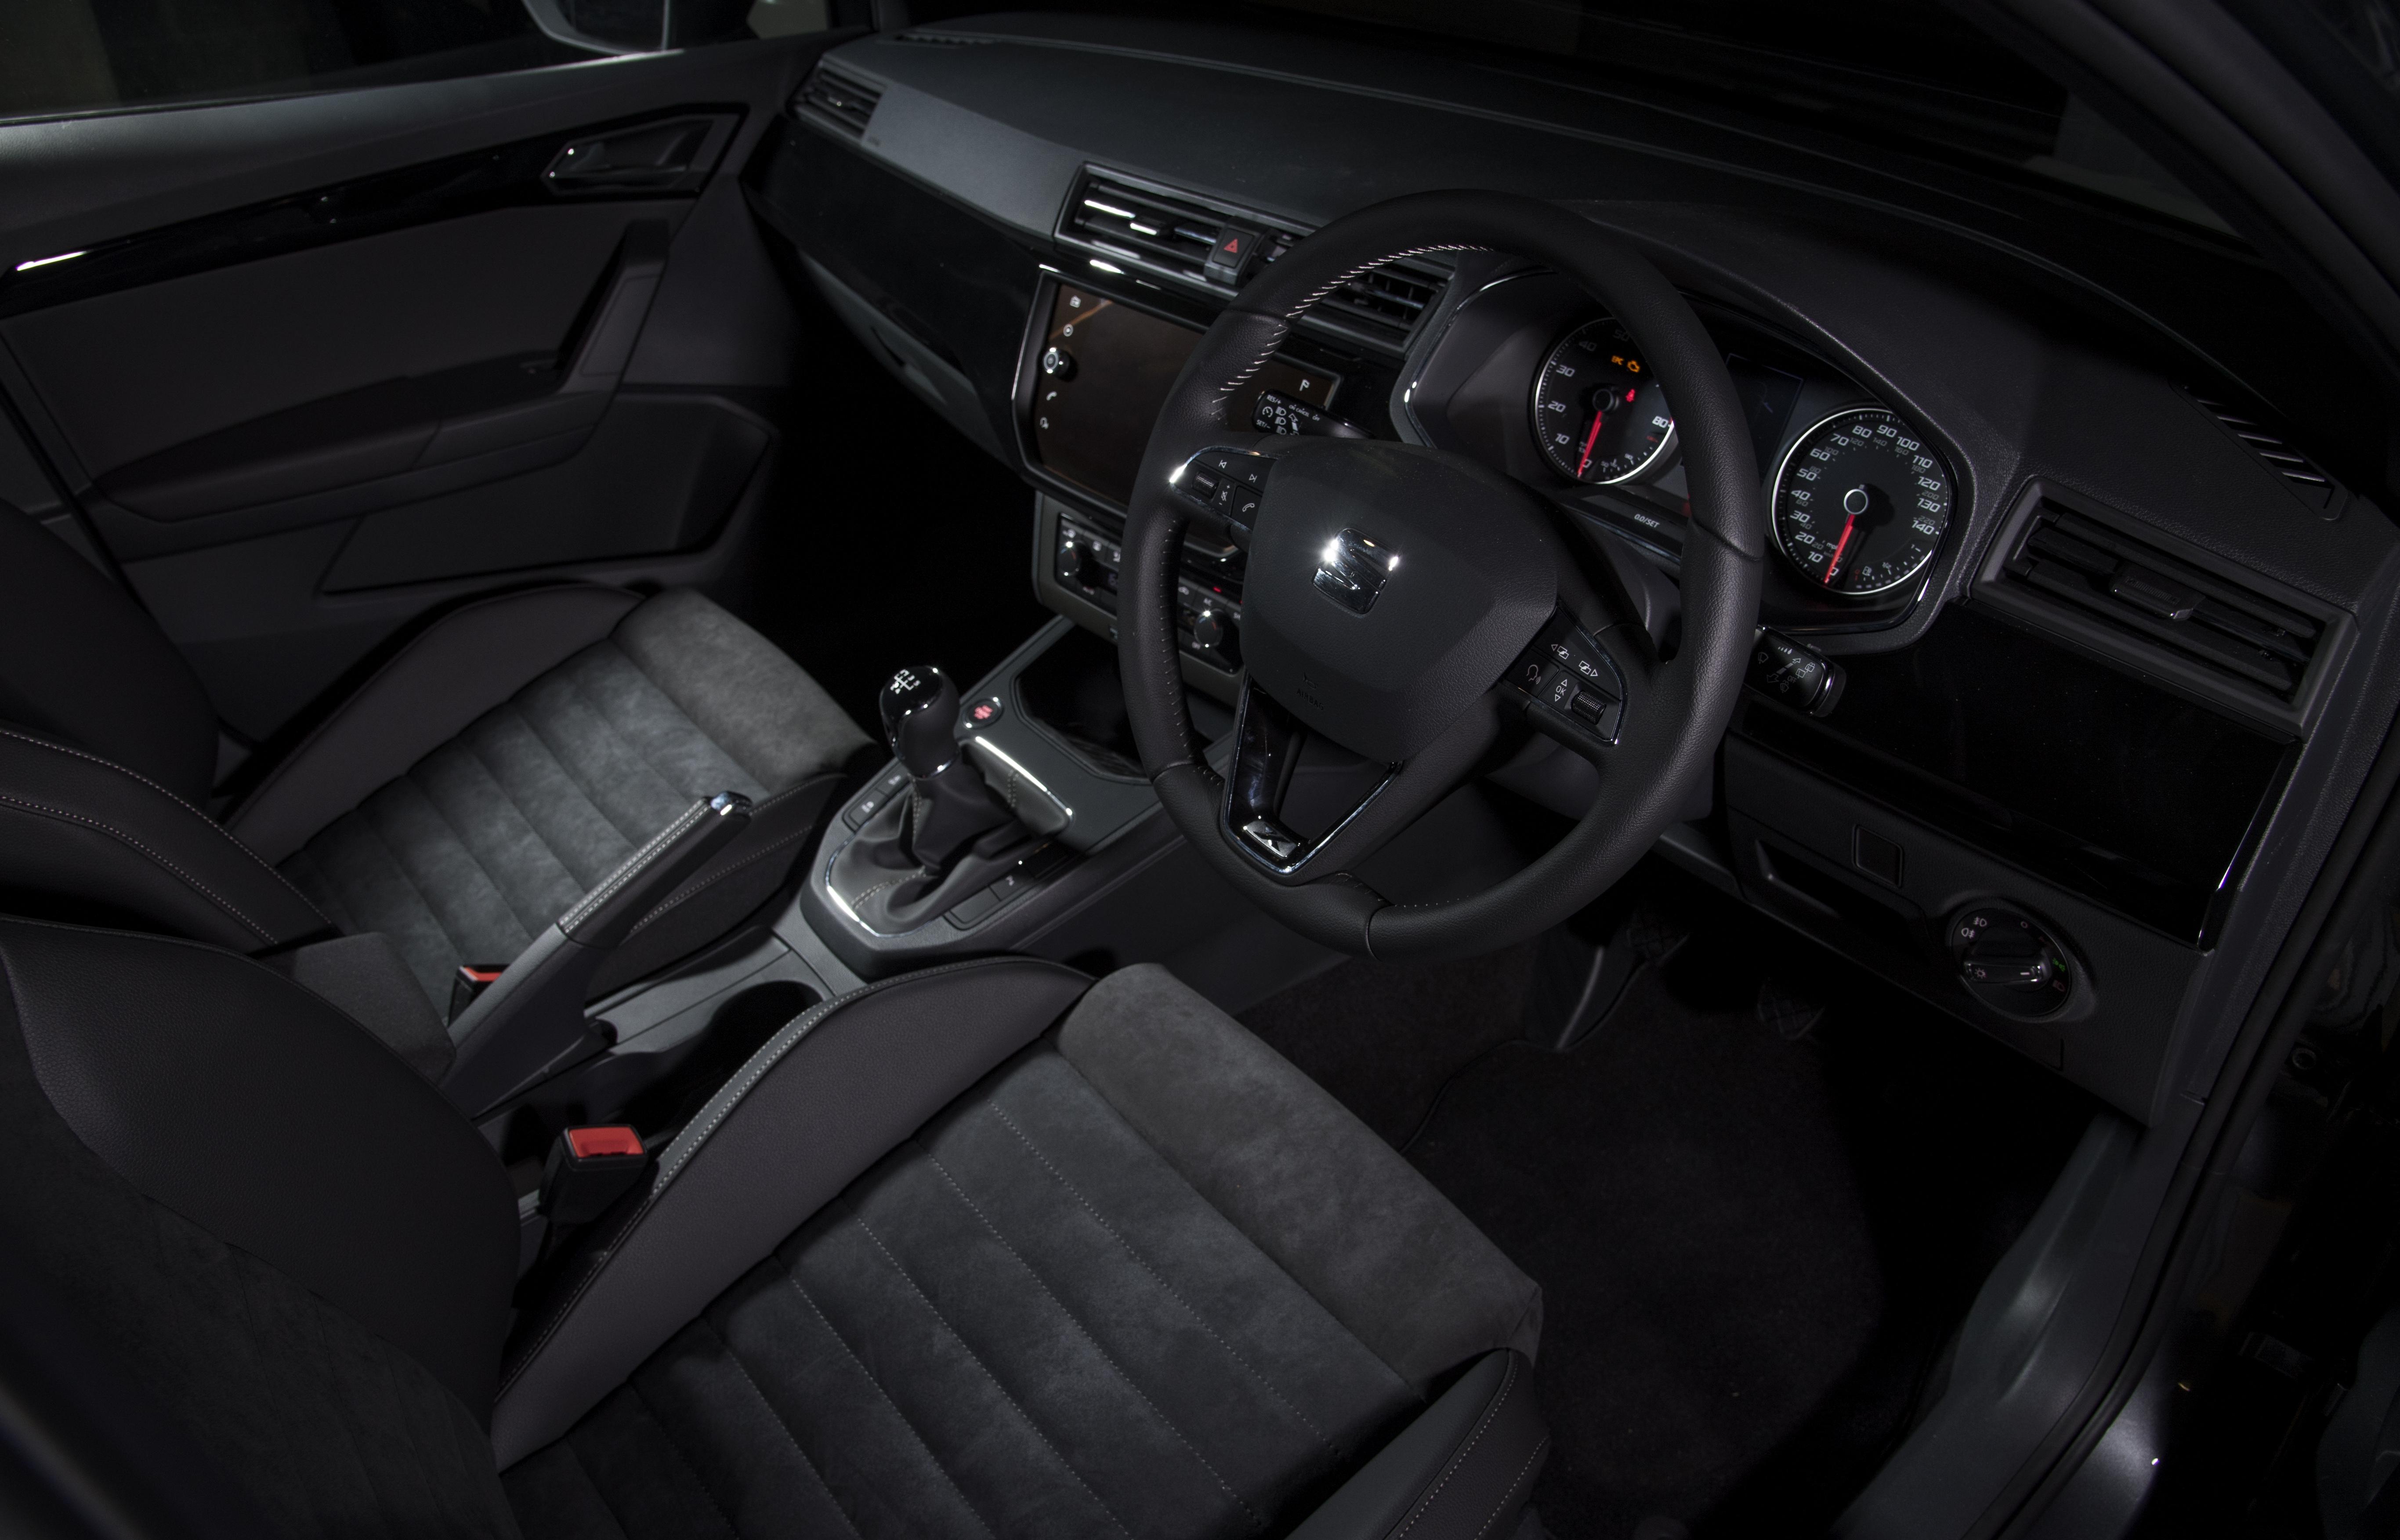 Seat ibiza fr 1 0 tsi 115ps 2017 hatchback review car keys for Interior ibiza 2017